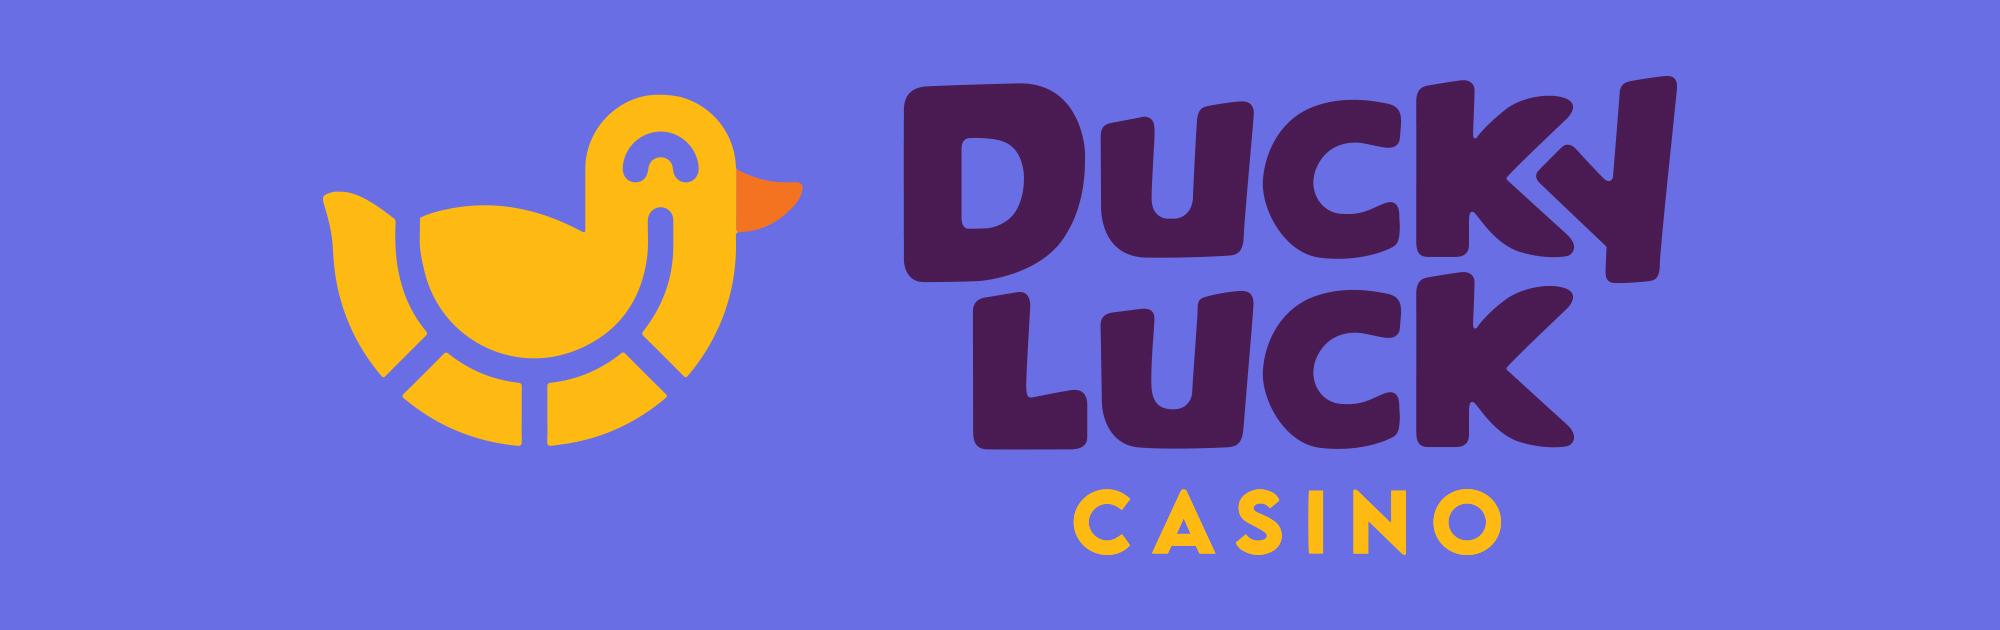 Ducky luck casino review